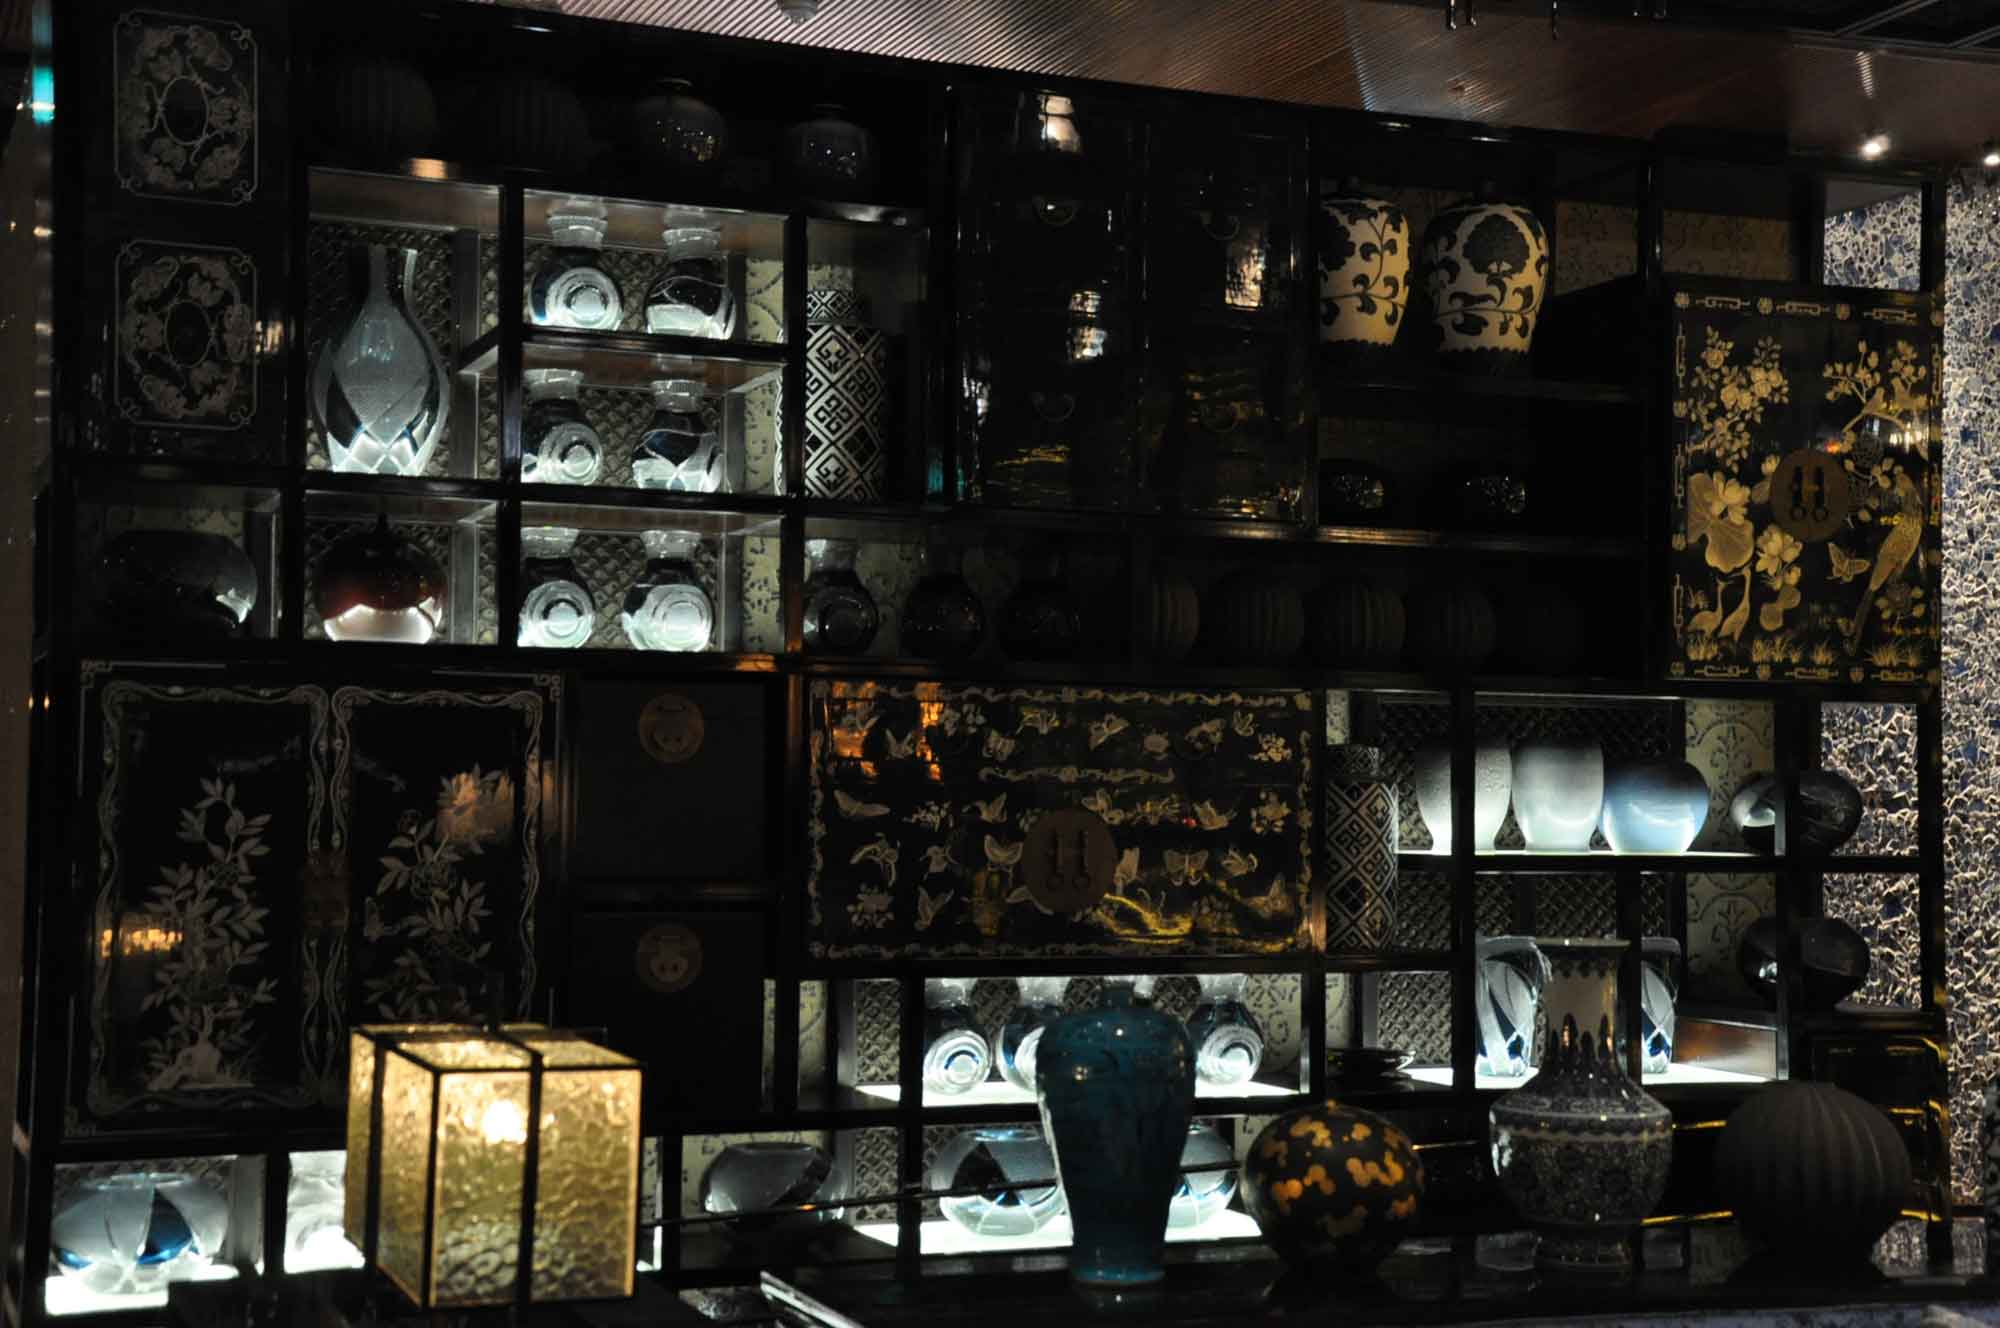 Lai Heen Macau vases and decoration